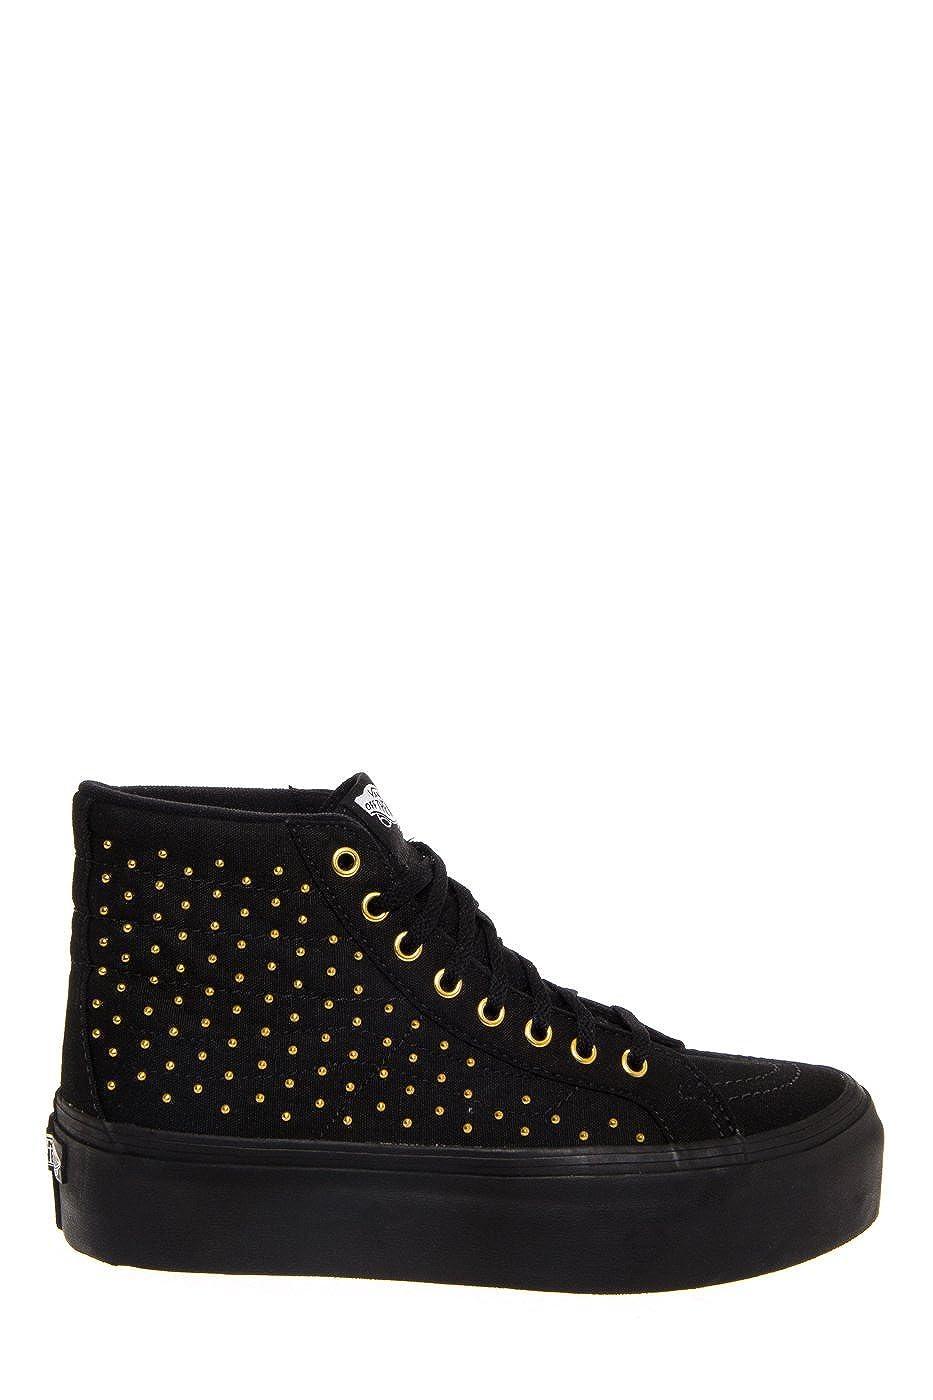 635e9303e9 Vans Women s Sk8-Hi Studded Platform Sneakers